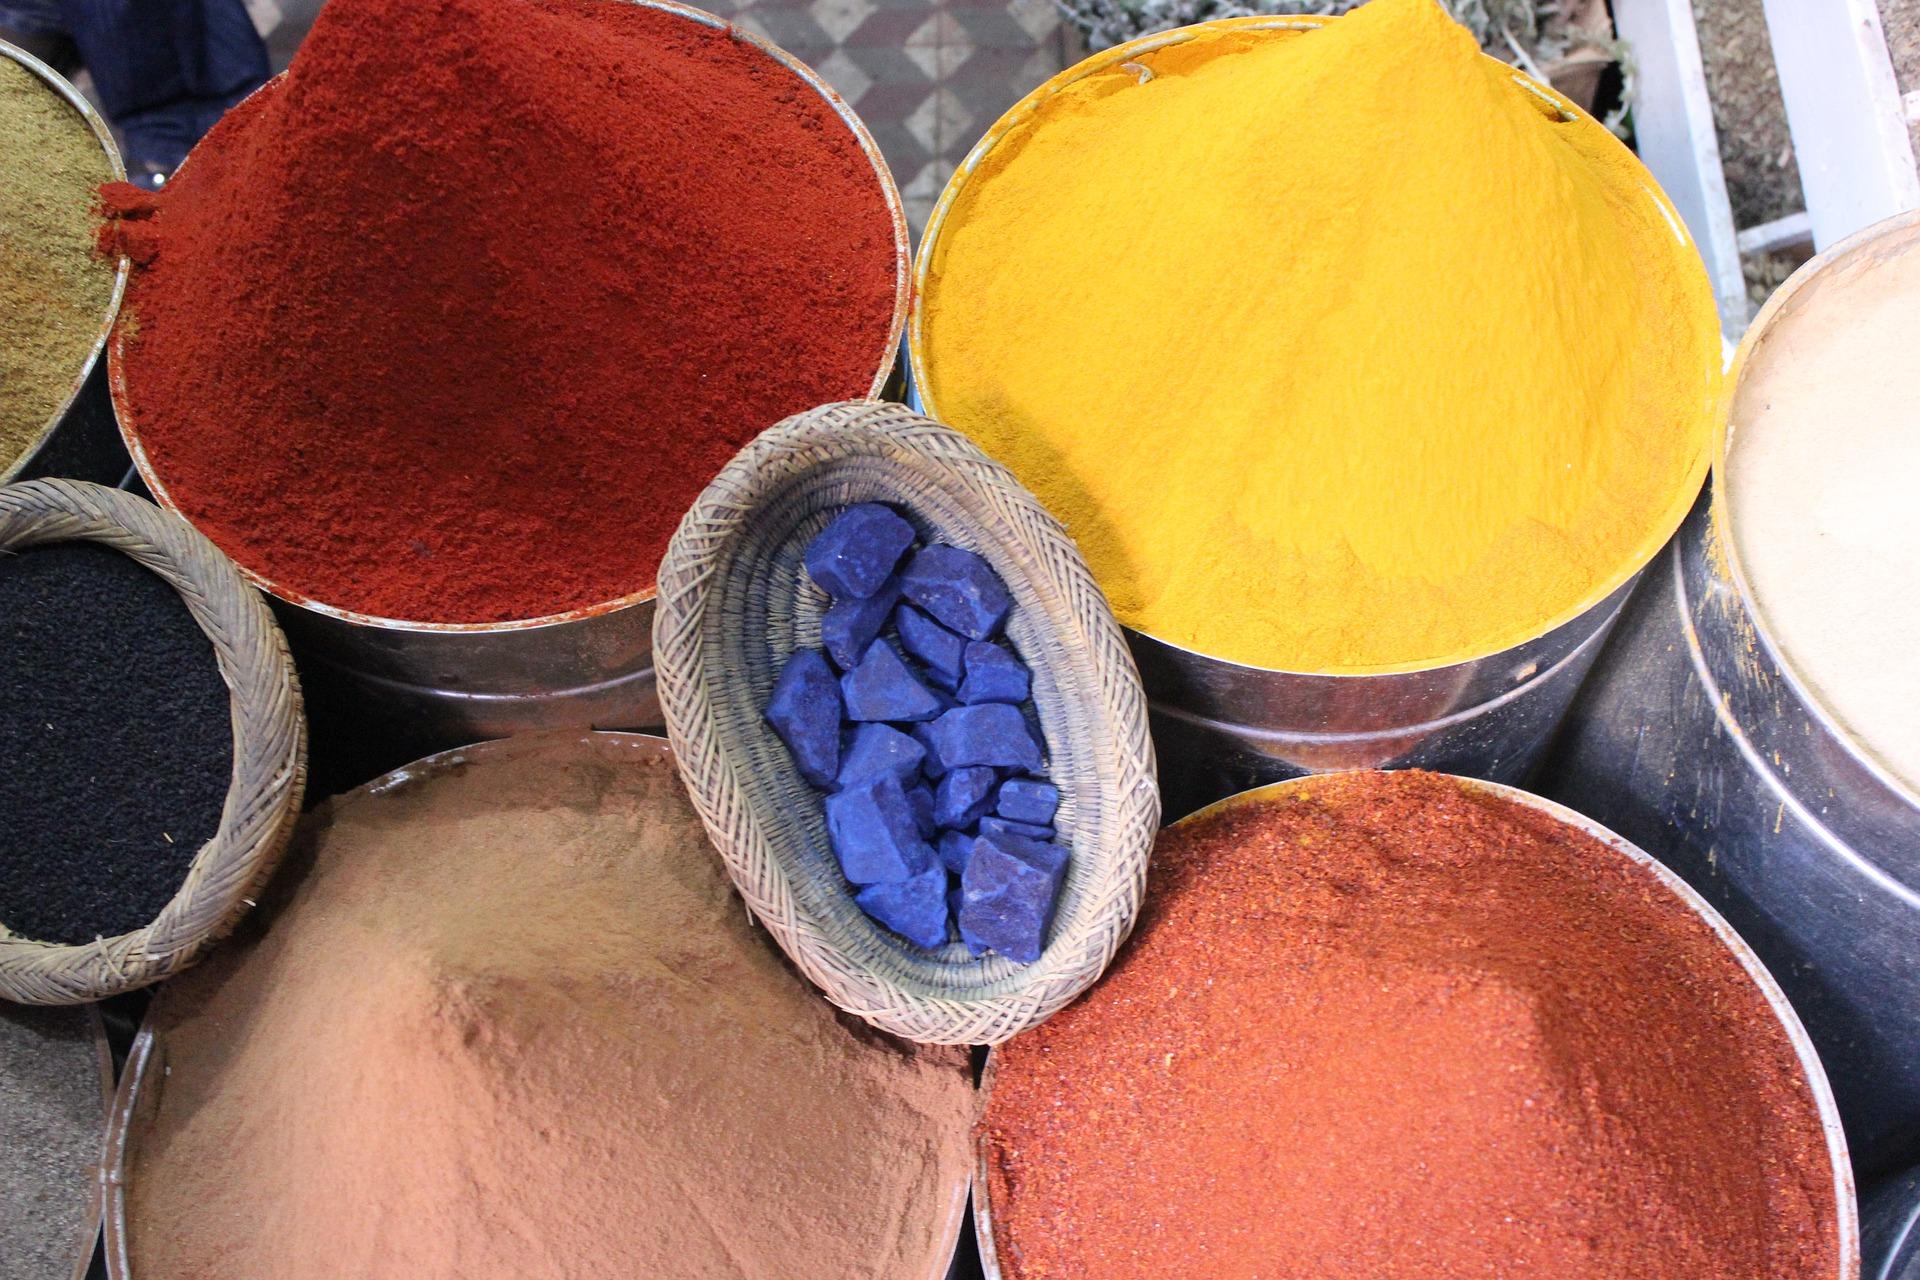 Le Pot de l'AFR 2: De Marokkaanse keuken